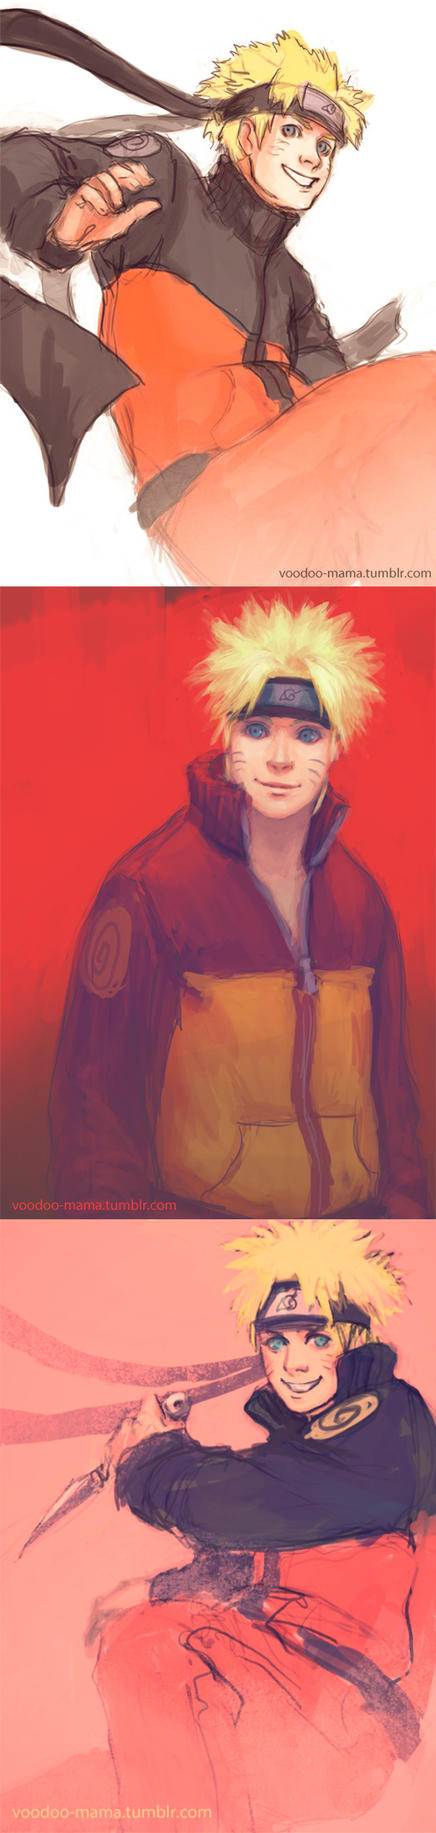 Naruto Sketch Dump III by CavalierediSpade